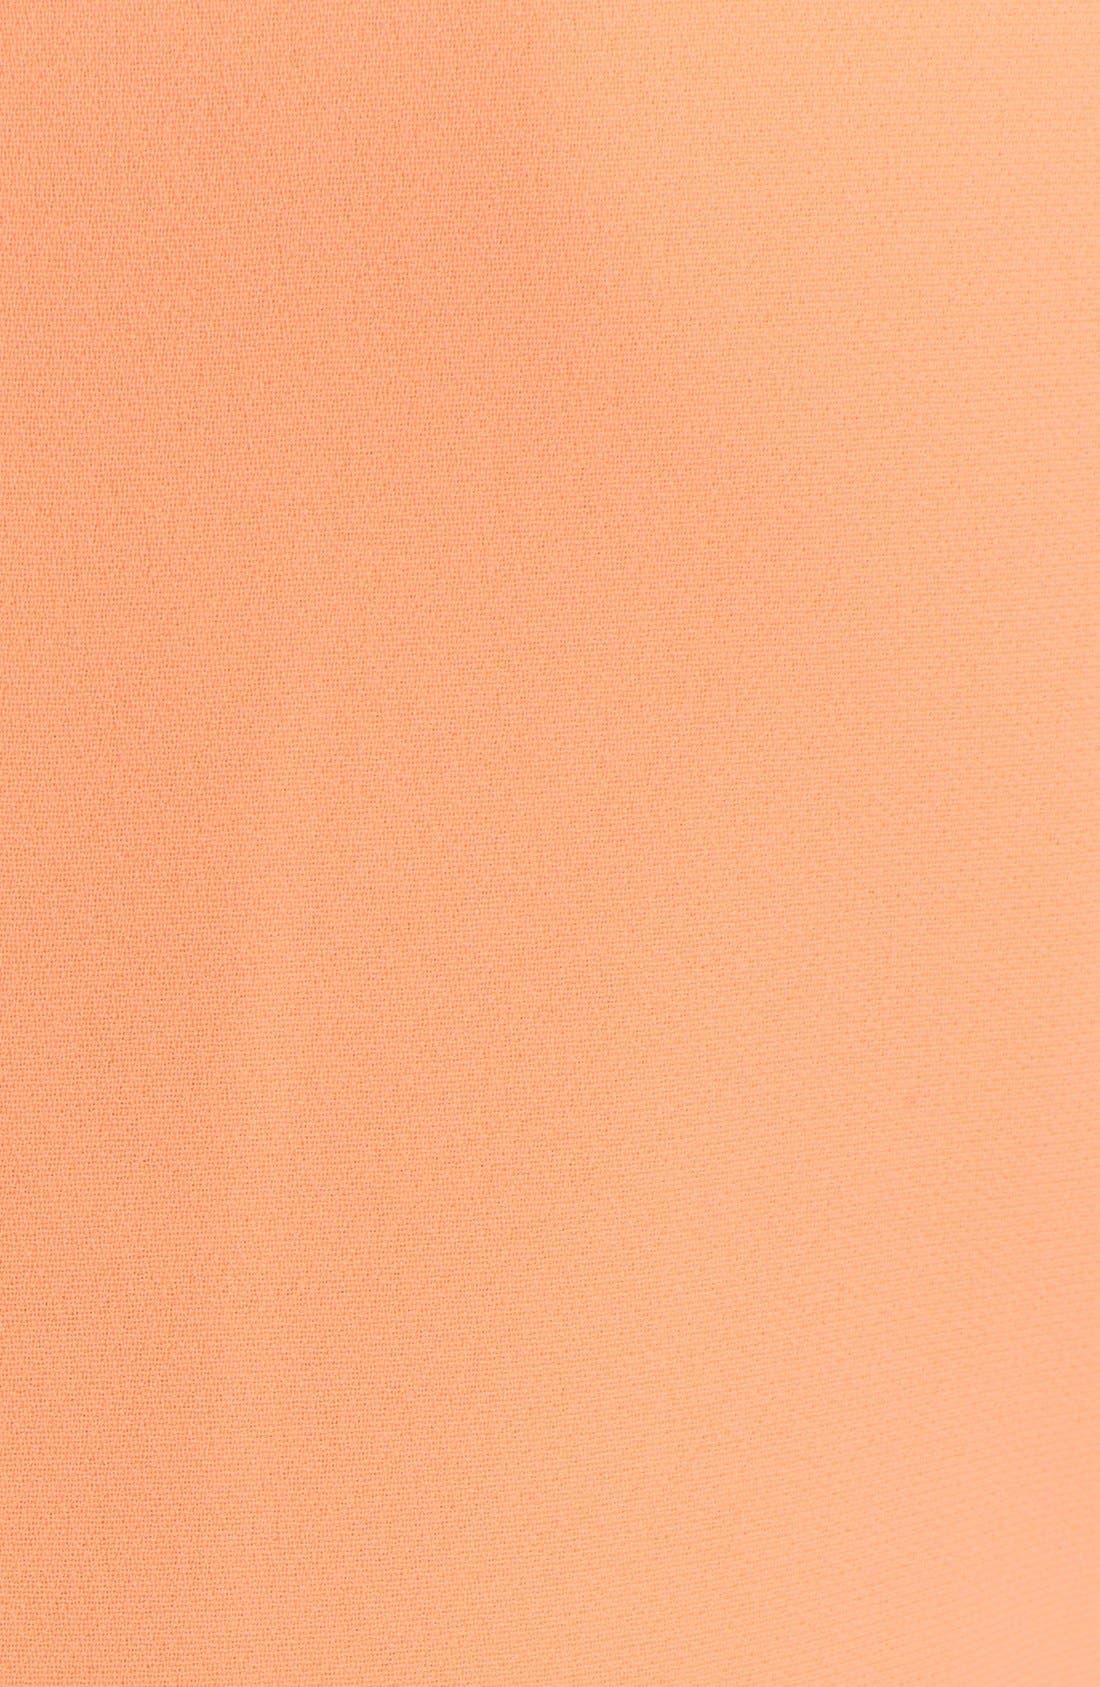 'Omelia' Ruffle Hem Stretch Sheath Dress,                             Alternate thumbnail 3, color,                             Light Orange